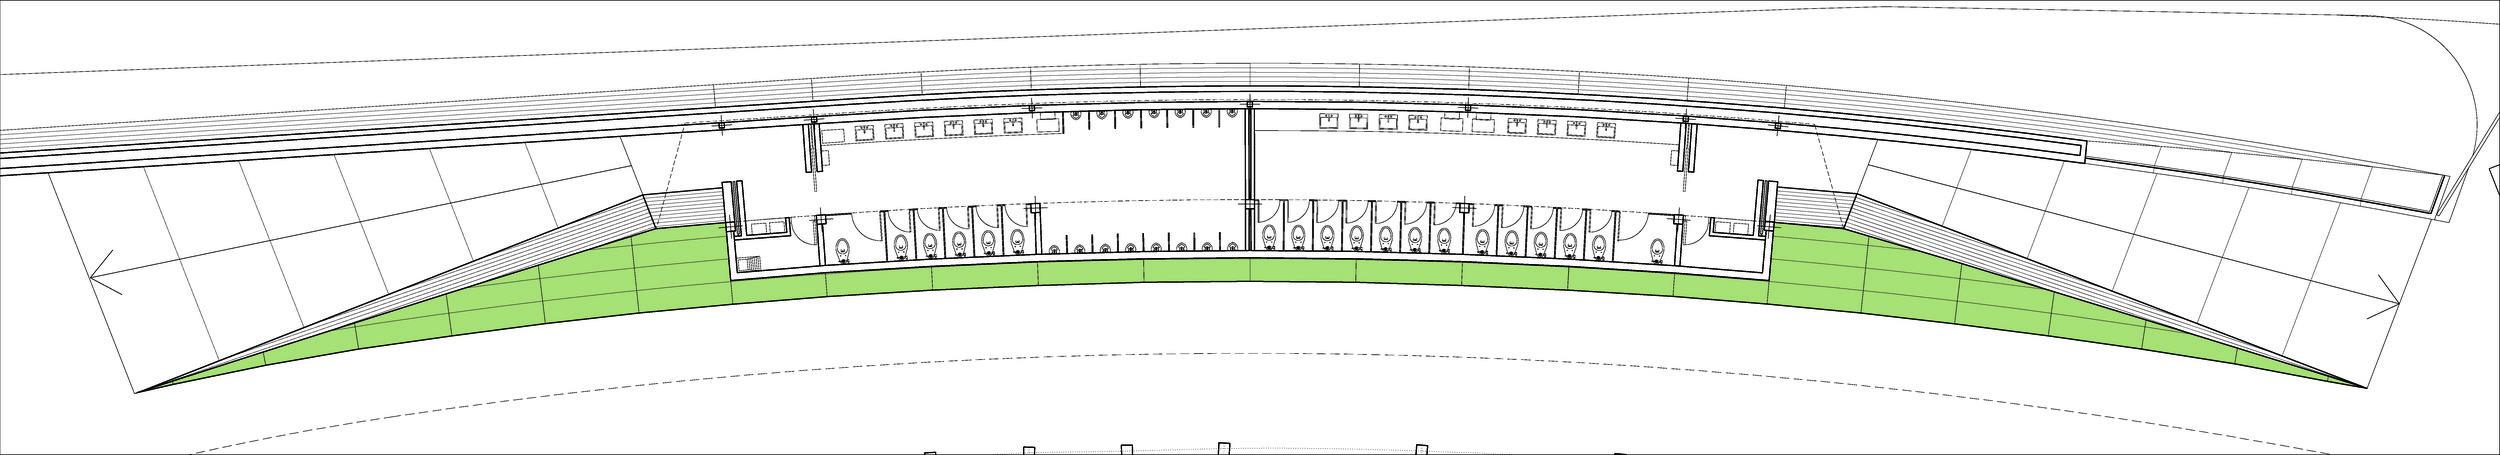 c planta baños olimpico 2.jpg